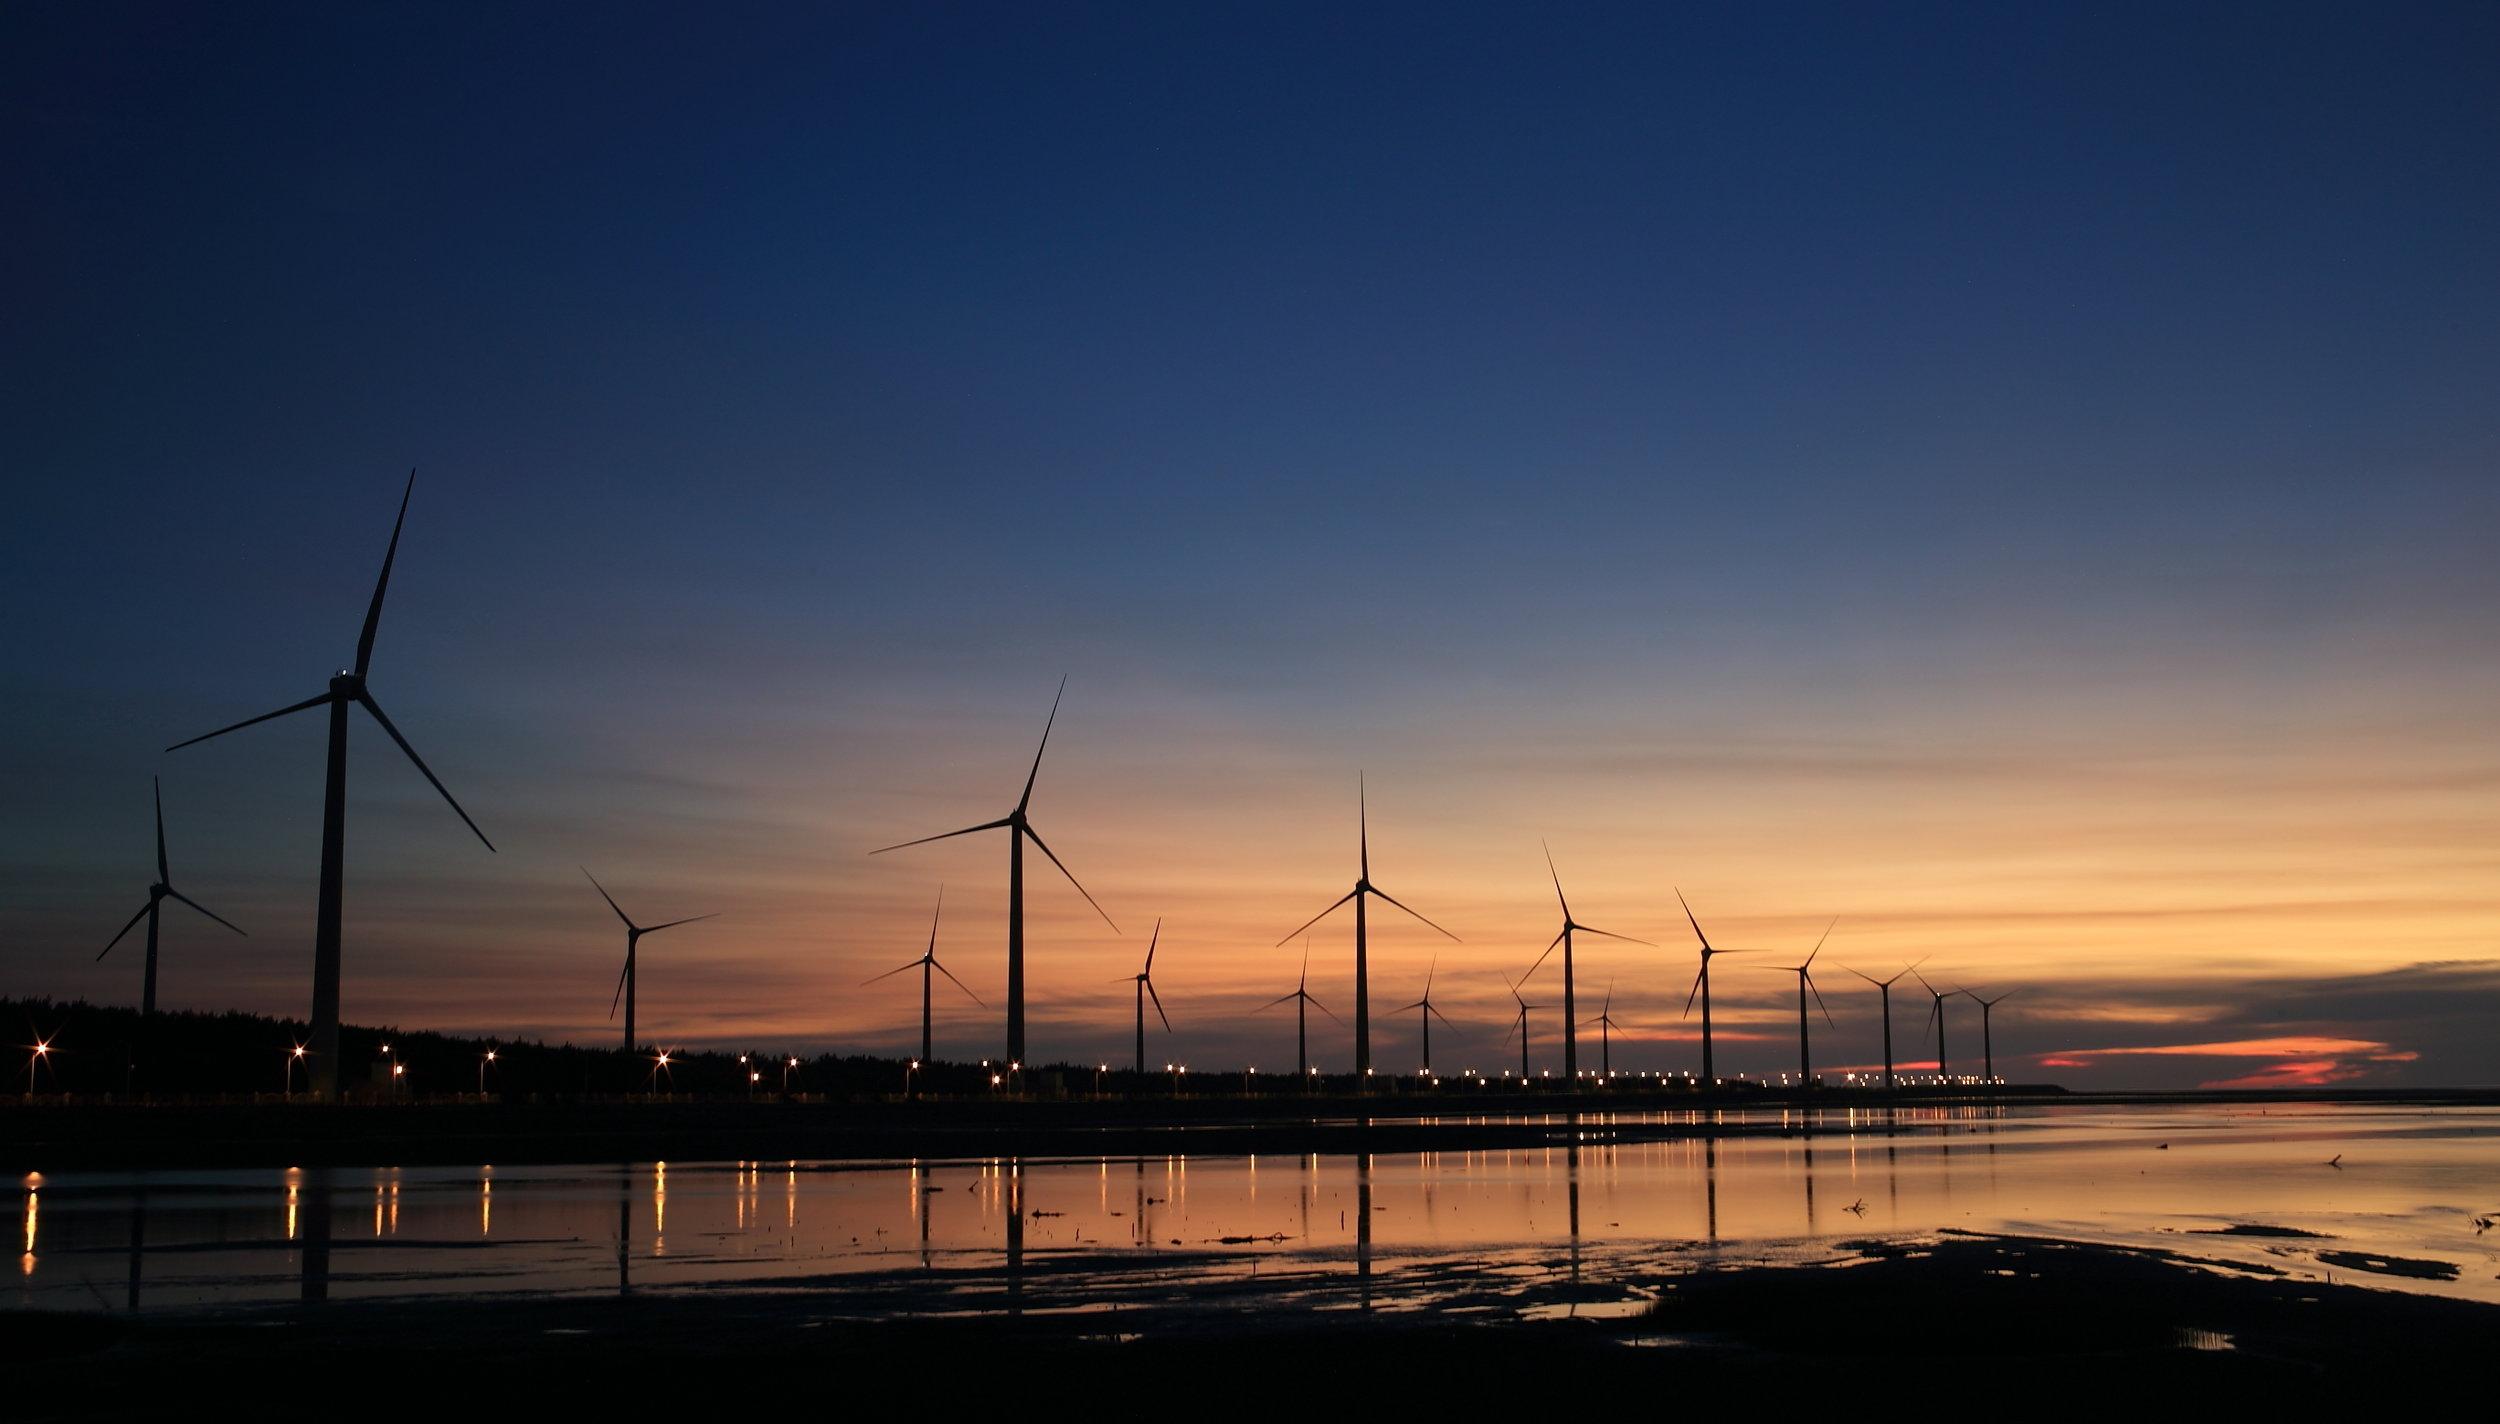 wind pexels-photo-157039.jpeg